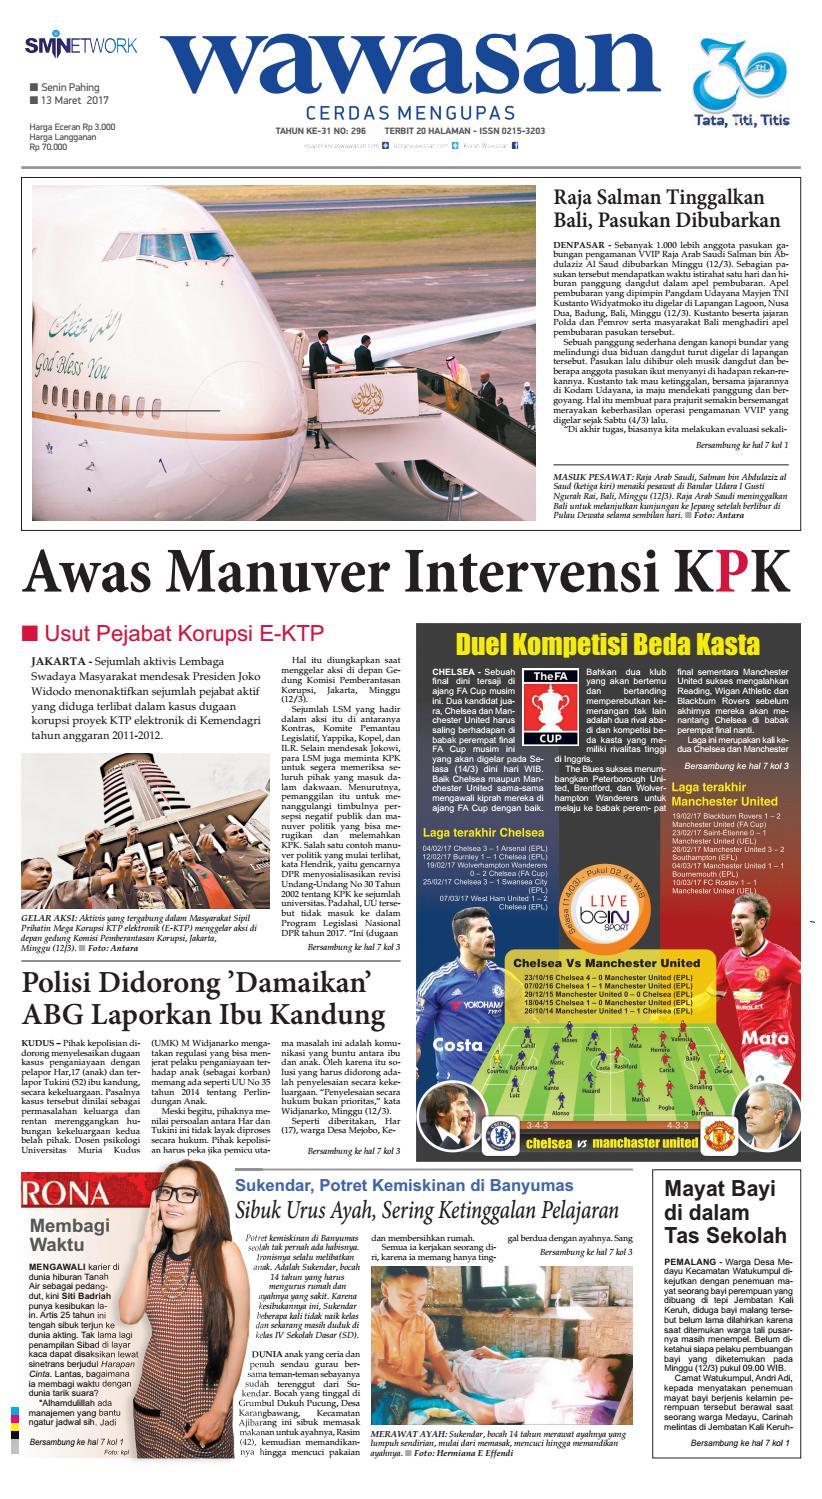 Wawasan 13 Maret 2017 By Koran Pagi Issuu Produk Ukm Bumn Jus Durian Lite Kuning Omah Duren